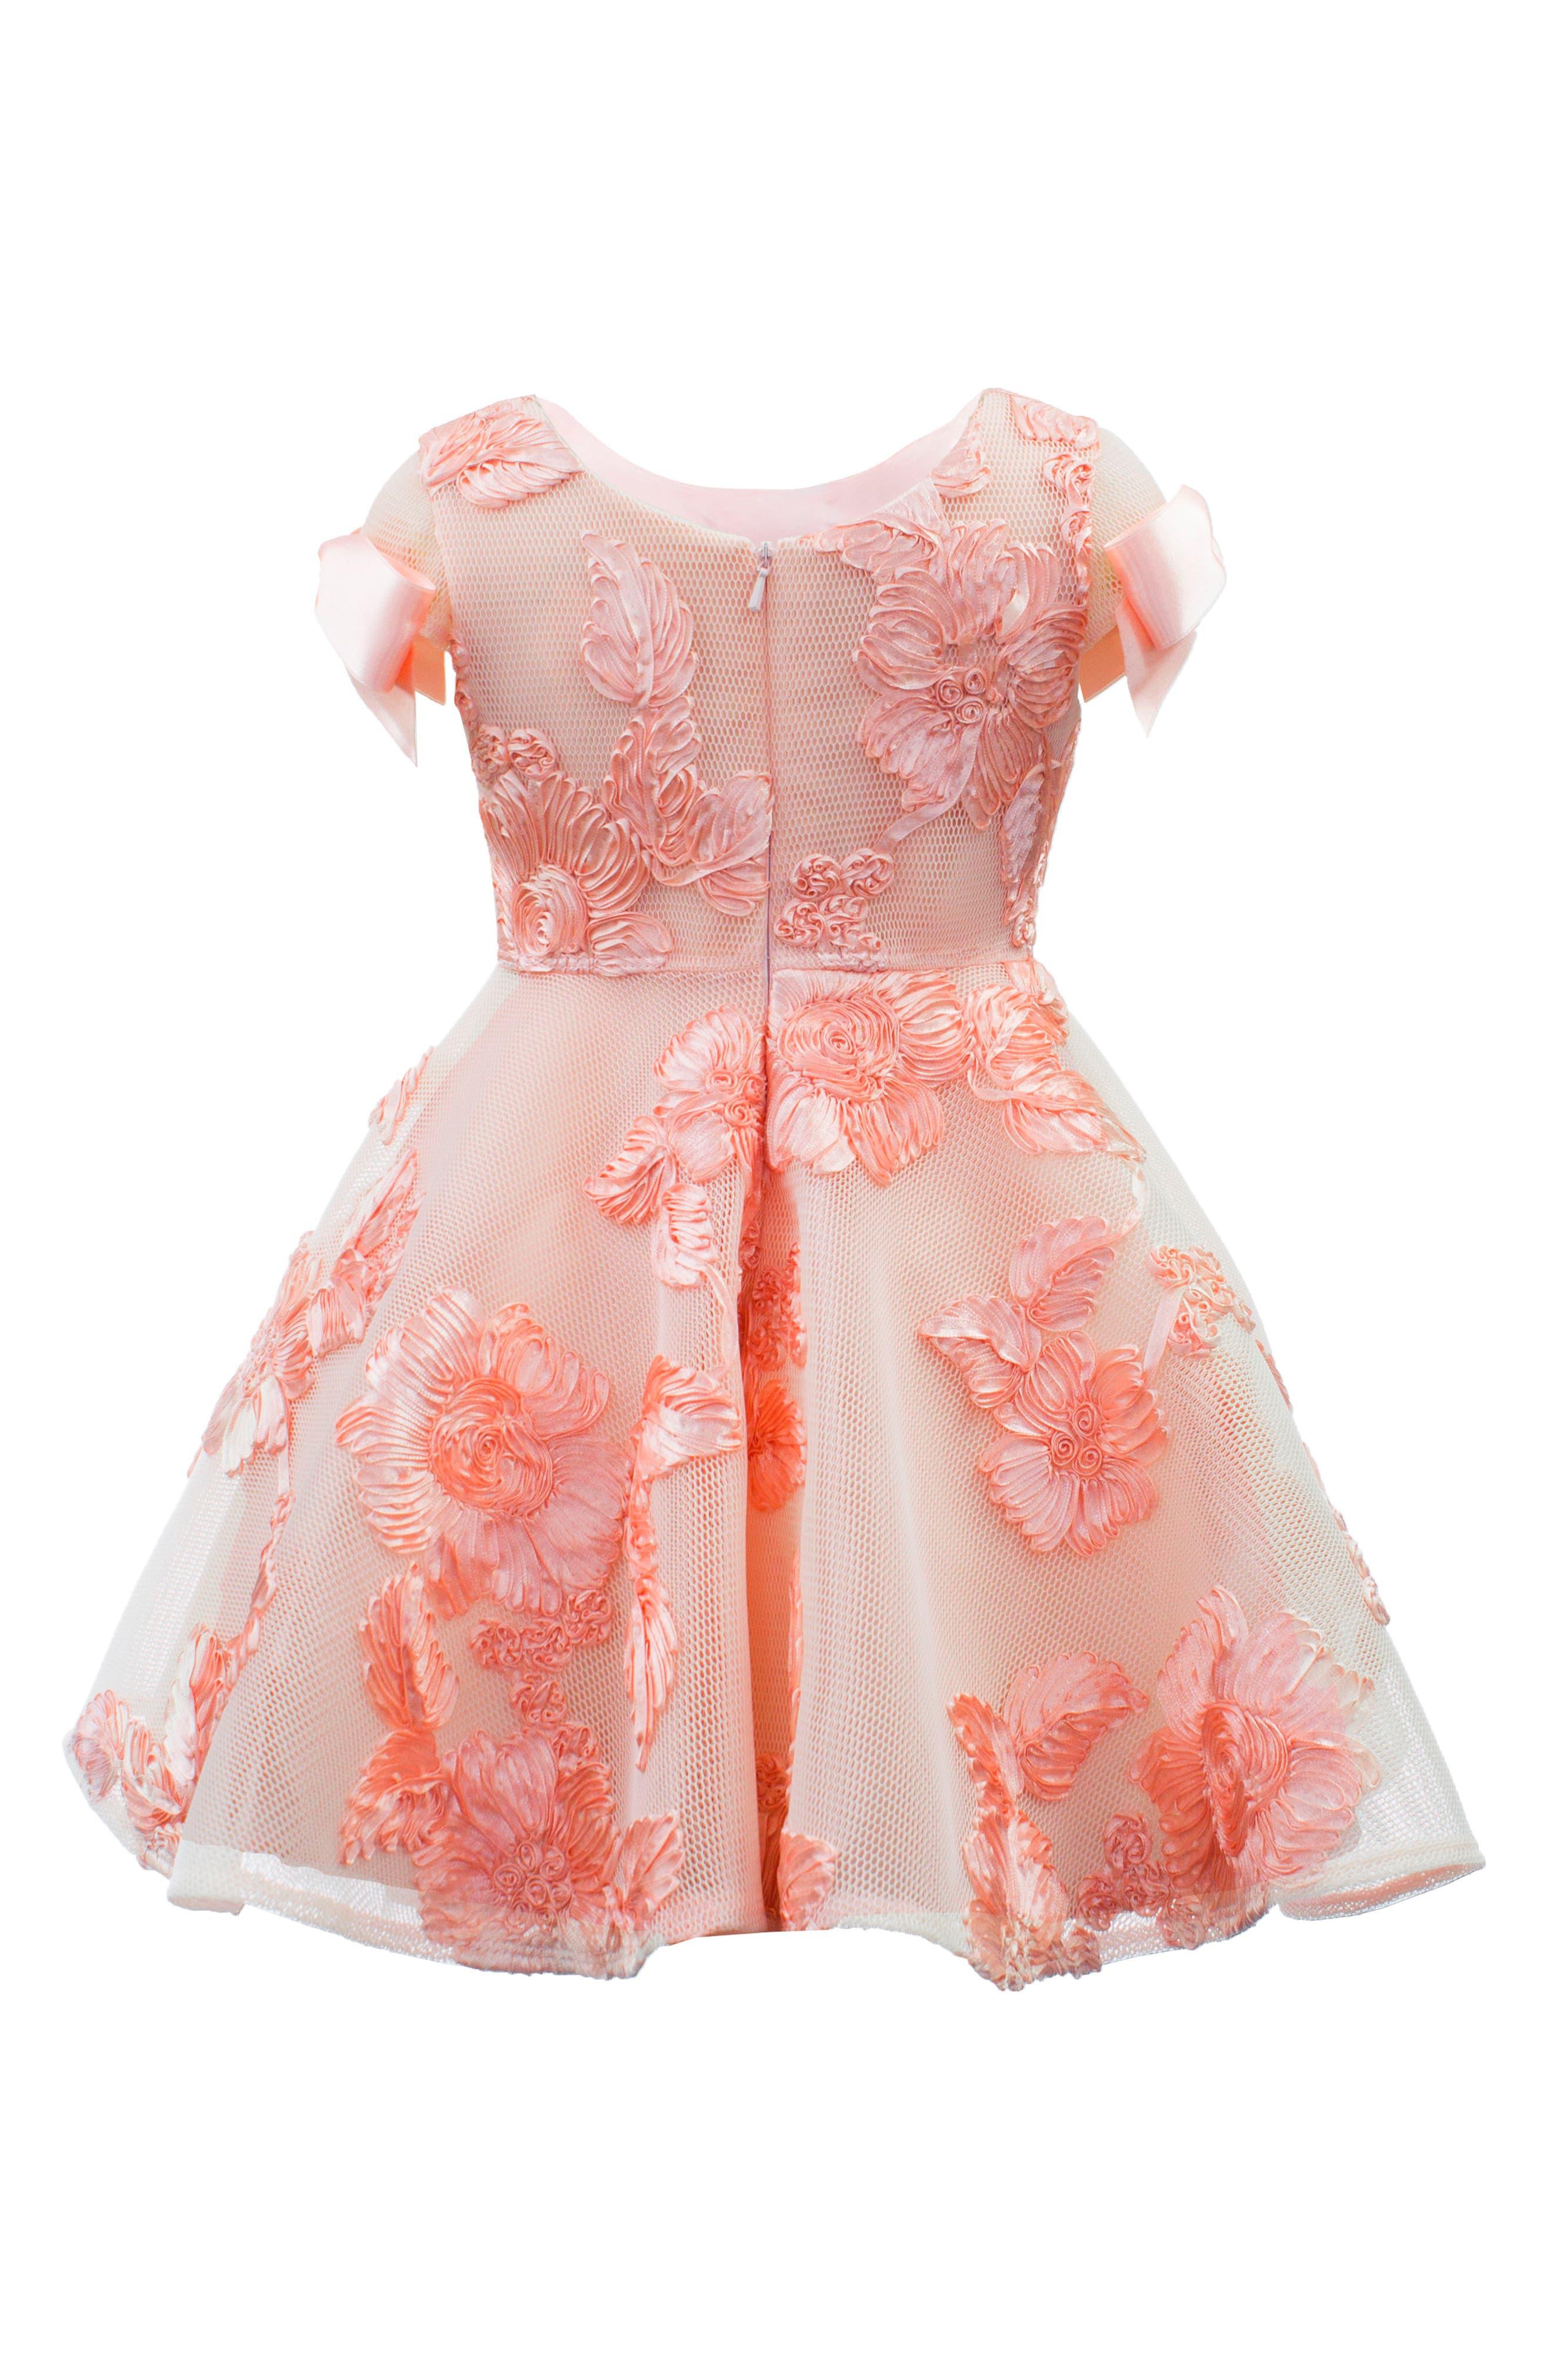 Soutache Embellished Mesh Dress,                             Alternate thumbnail 2, color,                             Blush Pink